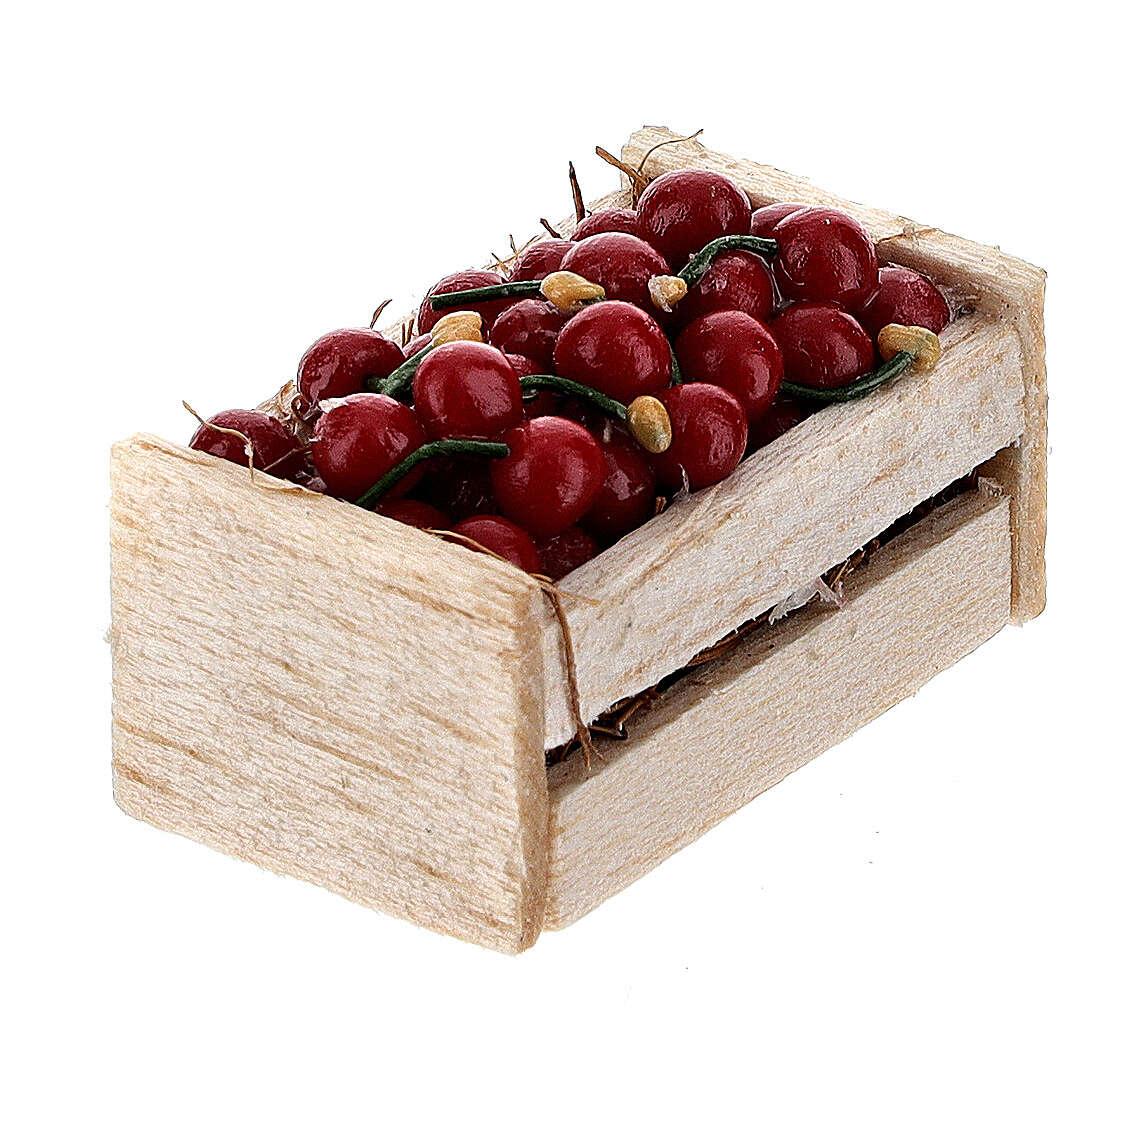 Cajitas fruta mixta belén 12 piezas 4